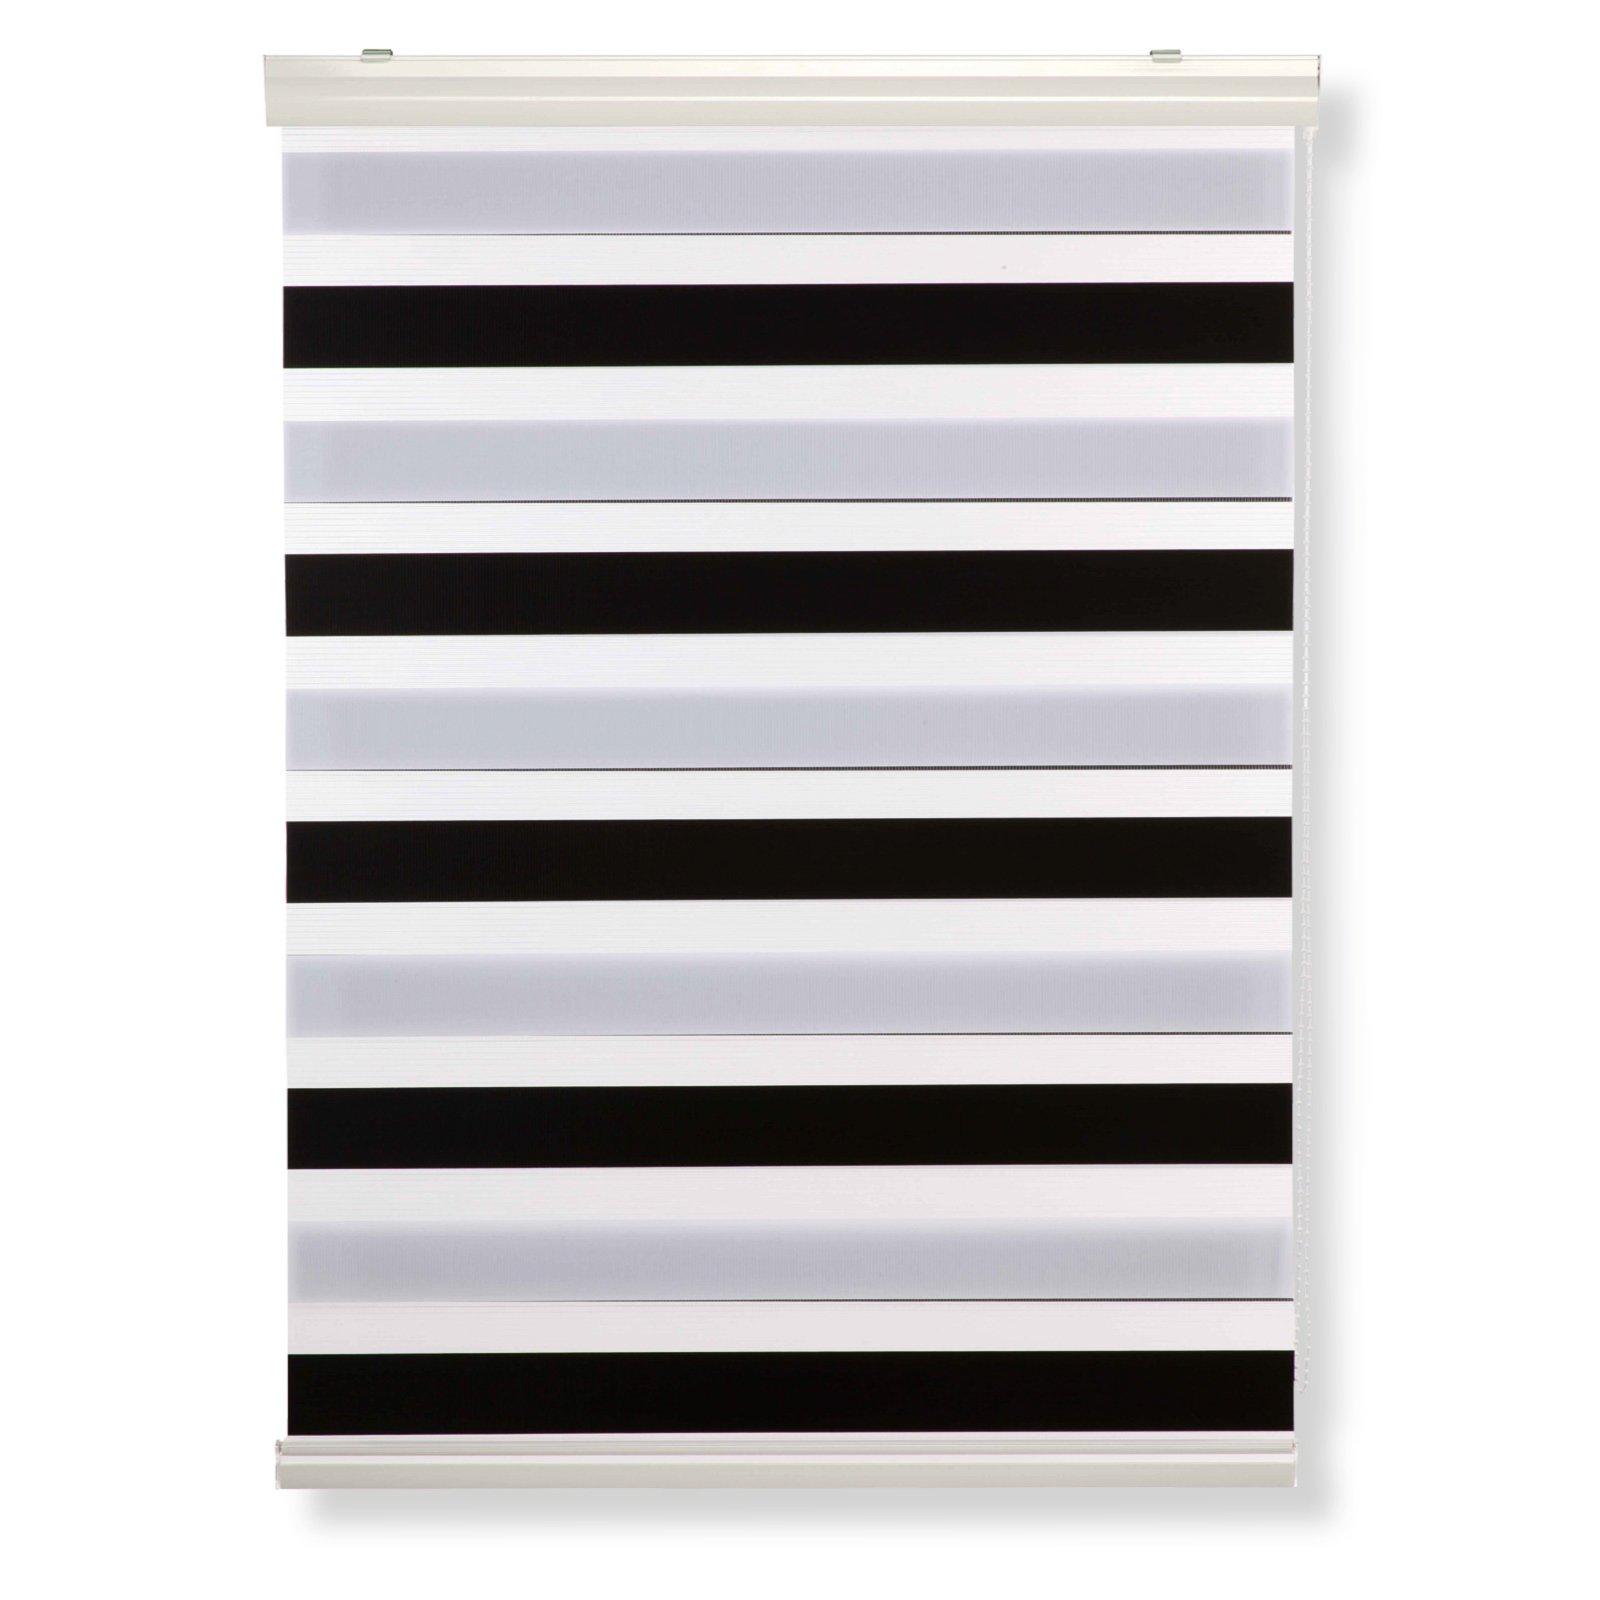 doppelrollo schwarz wei 120x180 cm doppelrollos rollos jalousien deko haushalt. Black Bedroom Furniture Sets. Home Design Ideas